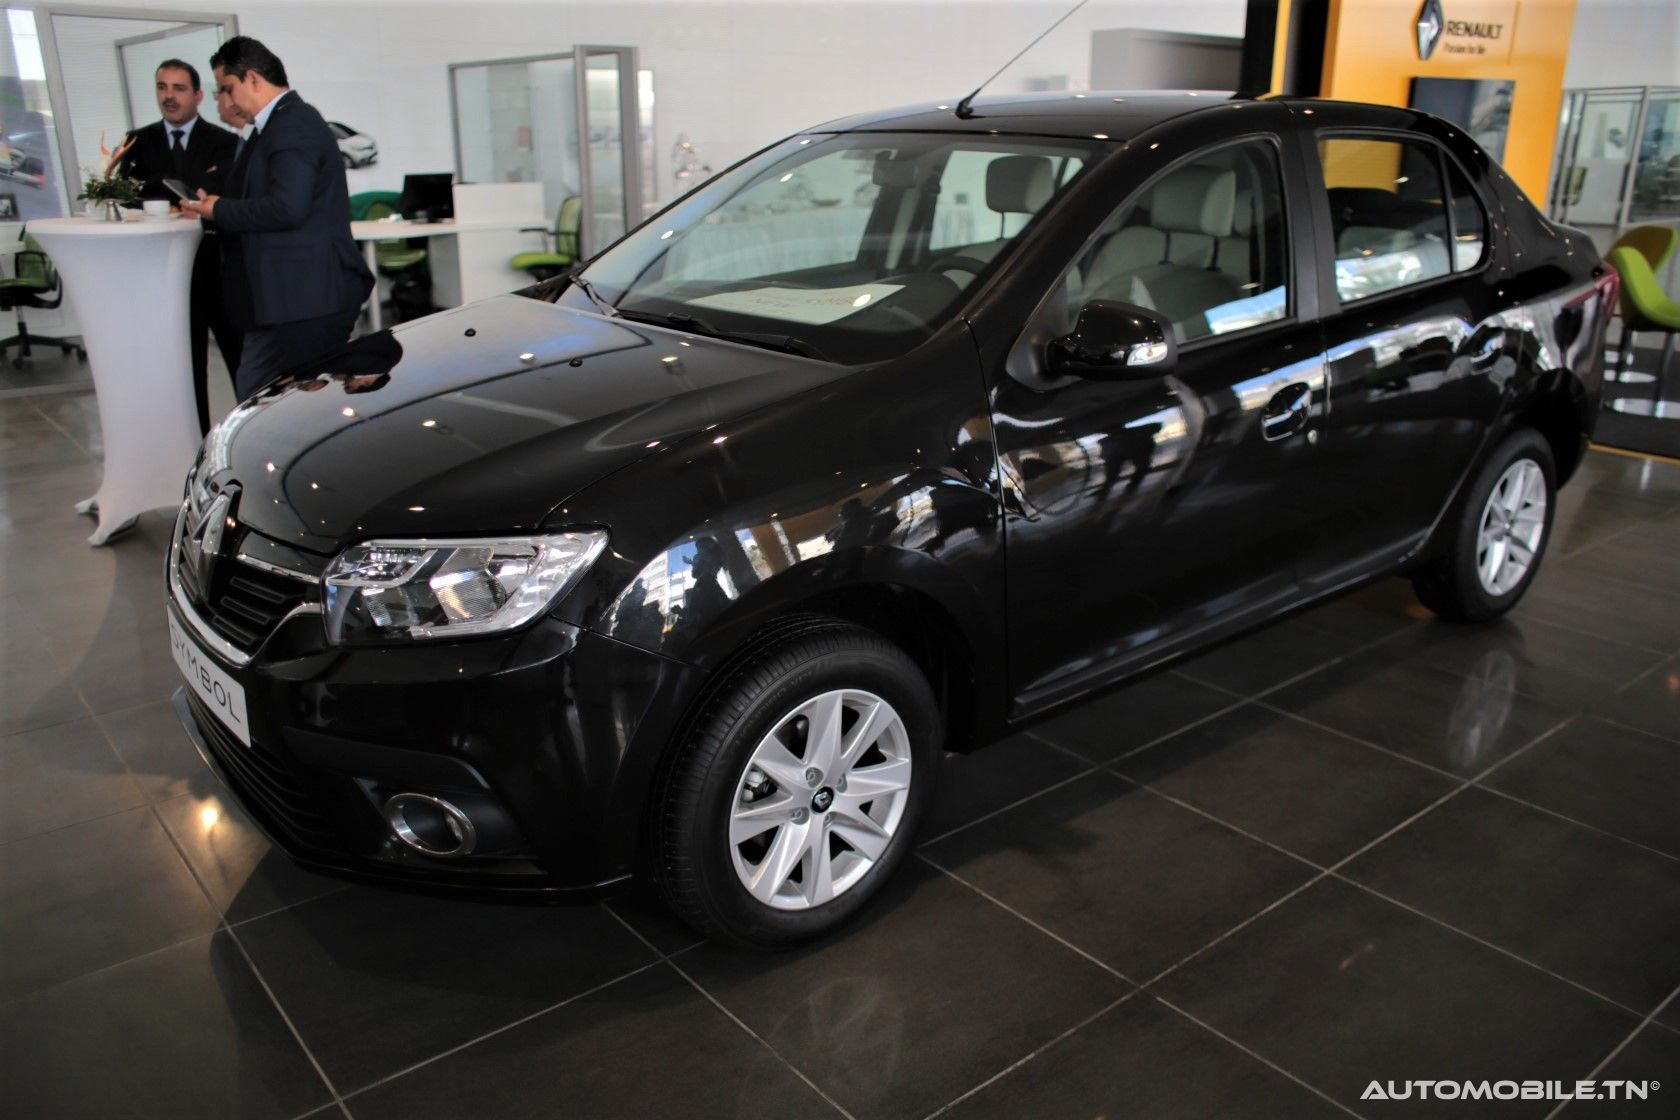 Prix Renault Symbol - A partir de 35 900 DT